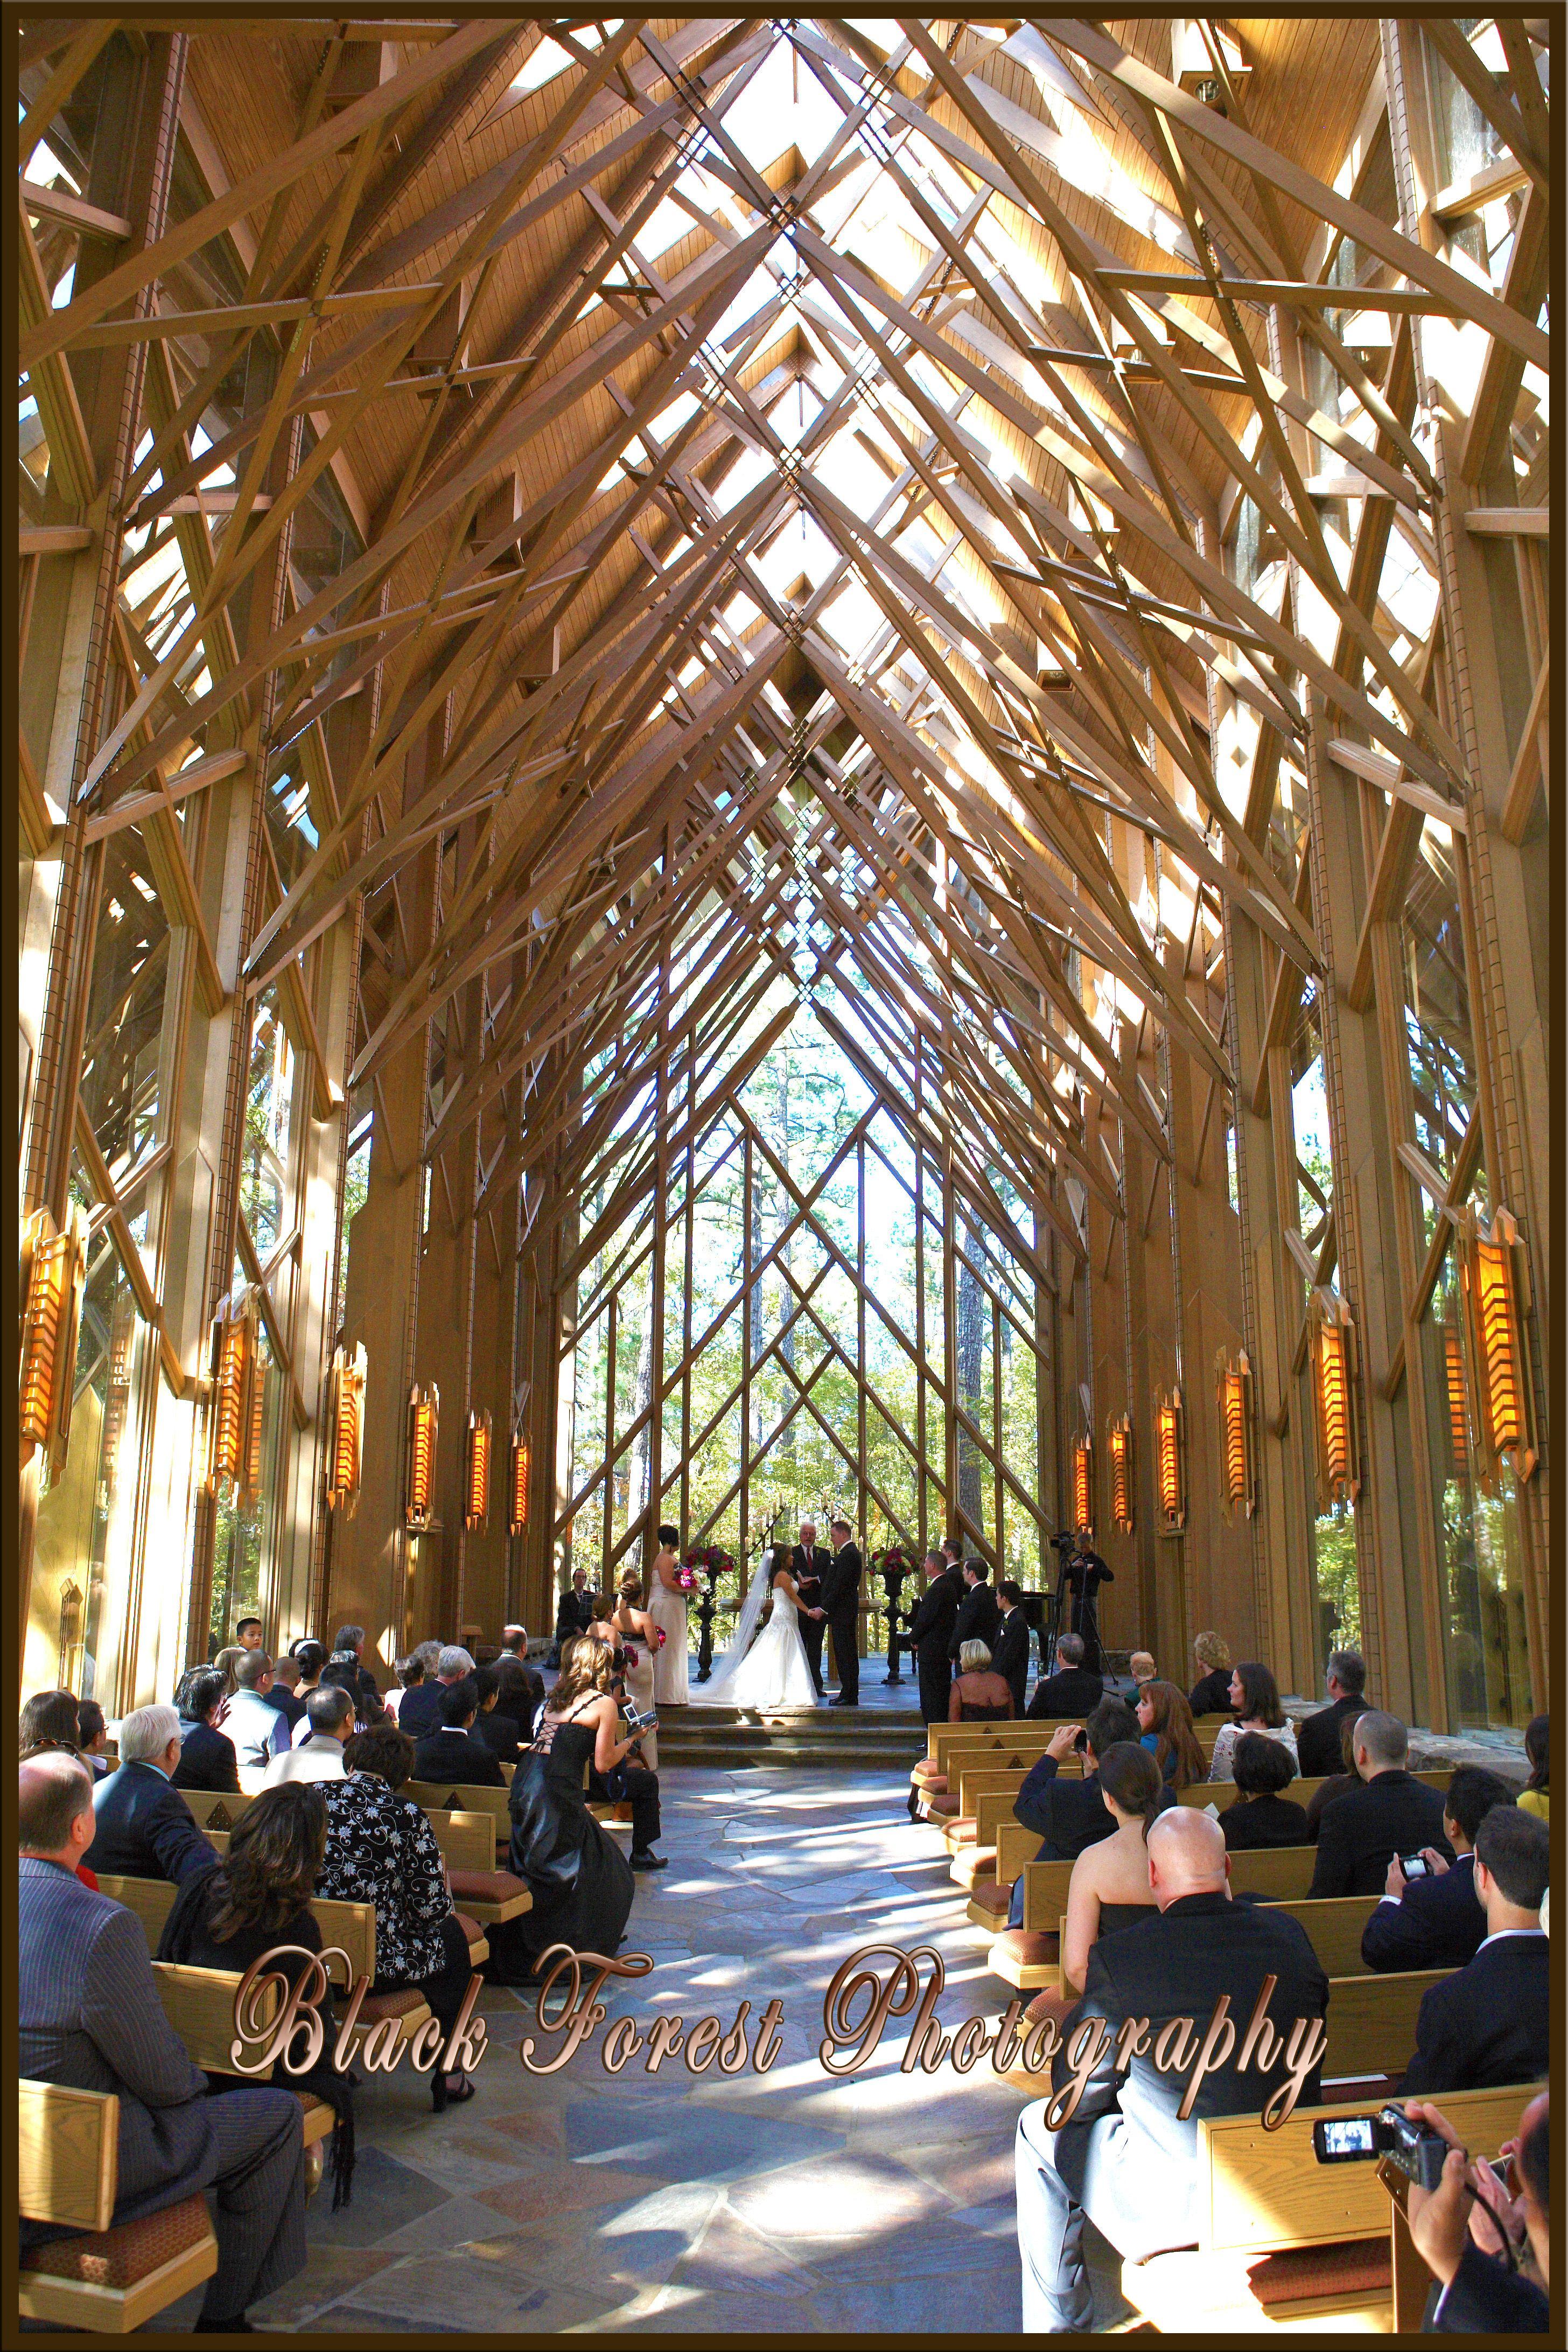 The Church At Garvin Woodland Gardens In Hot Springs Arkansas A Destination Wedding By Http Www Blackforestphoto Churchatgarvinwoodlandgardens